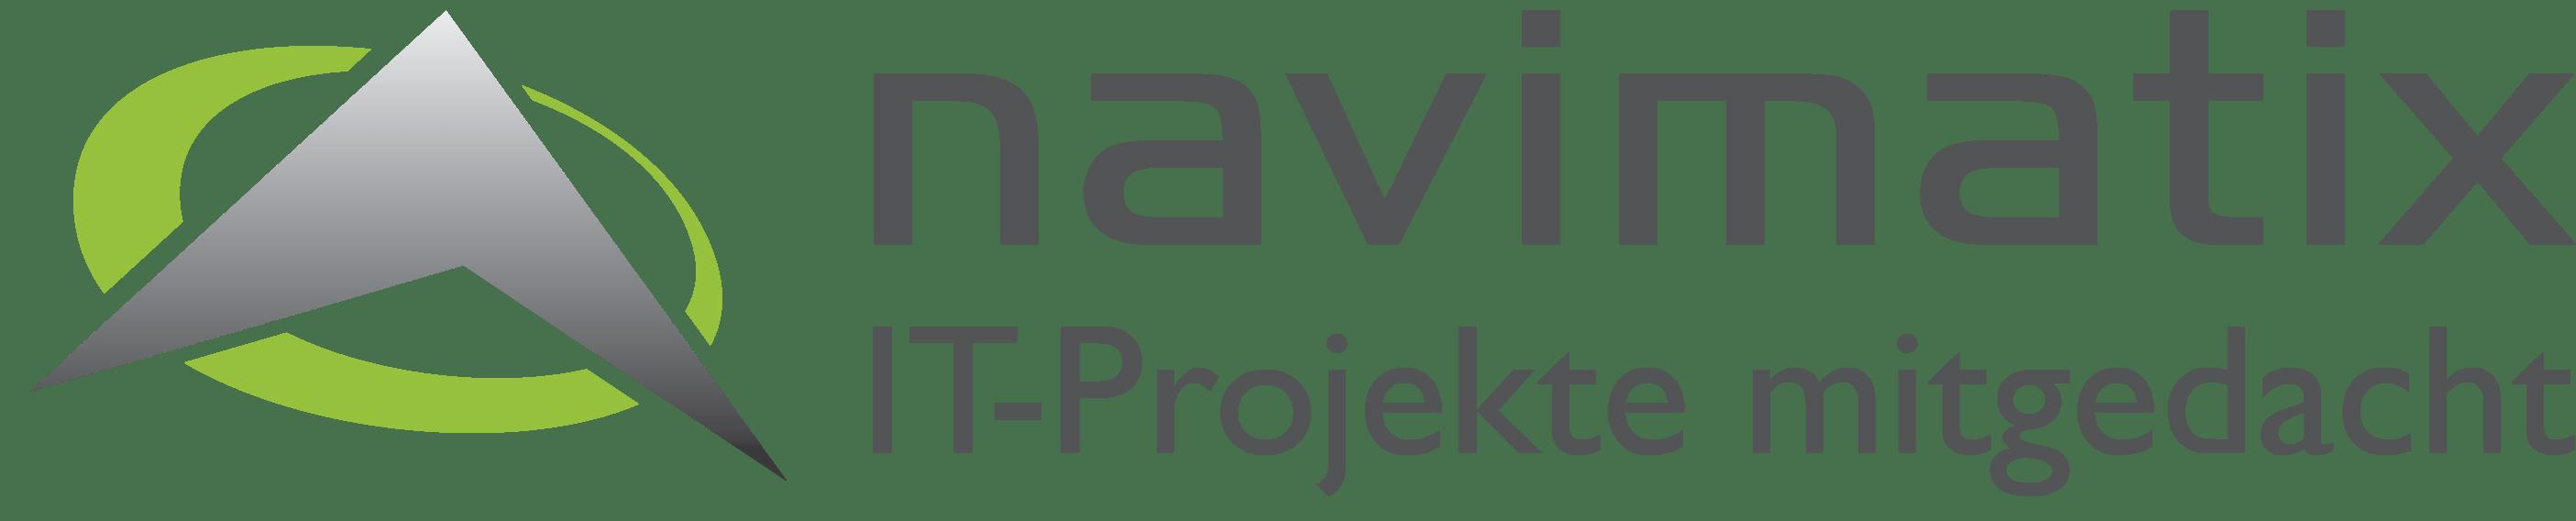 logo Navimatix GmbH